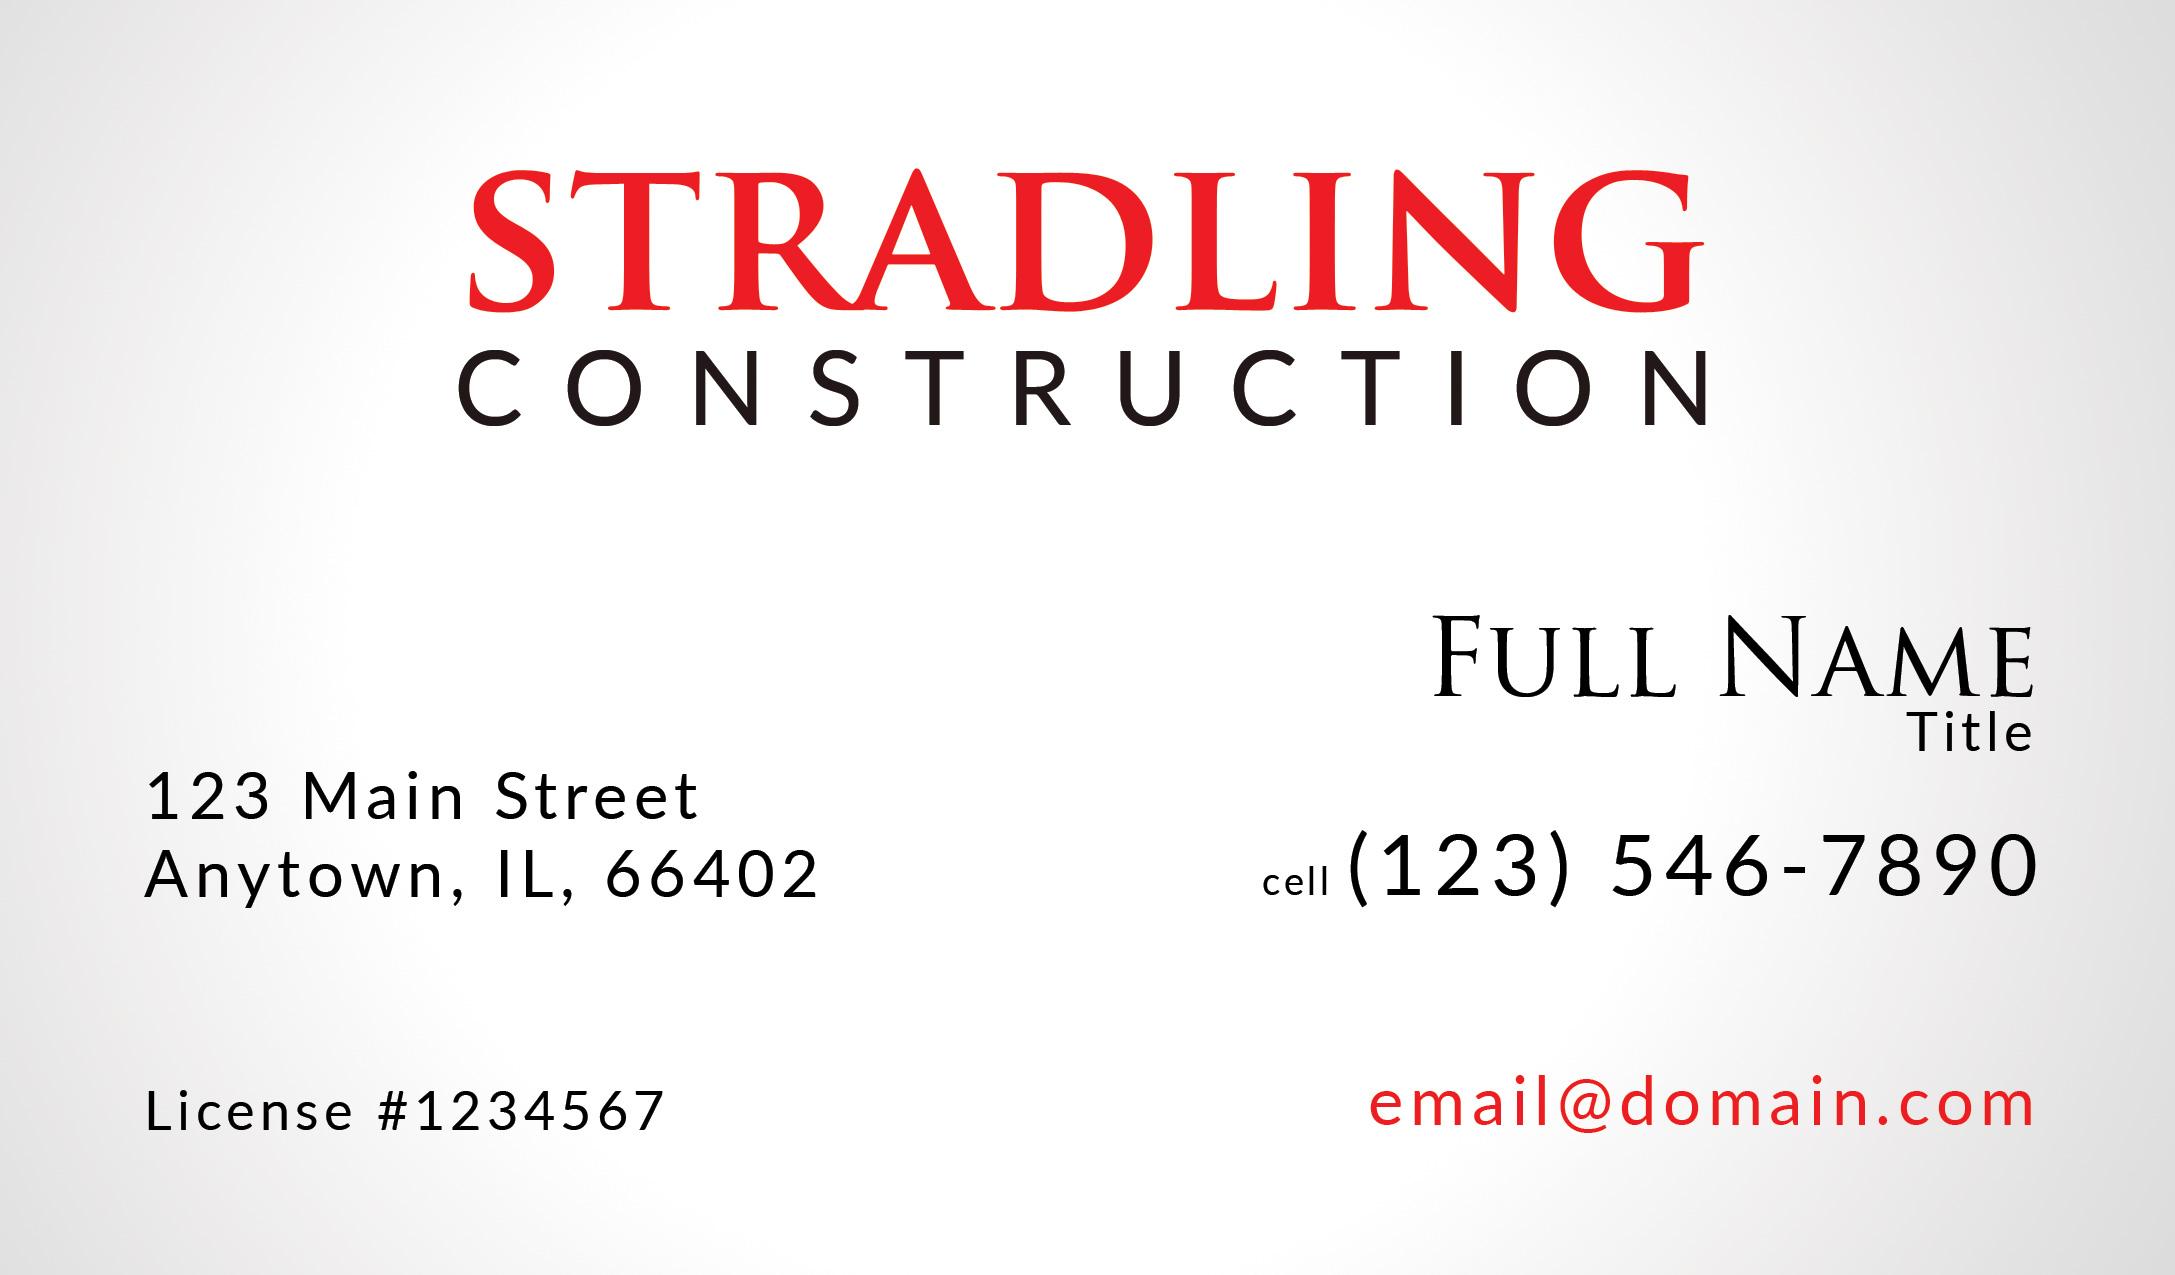 c_stradlingroofing